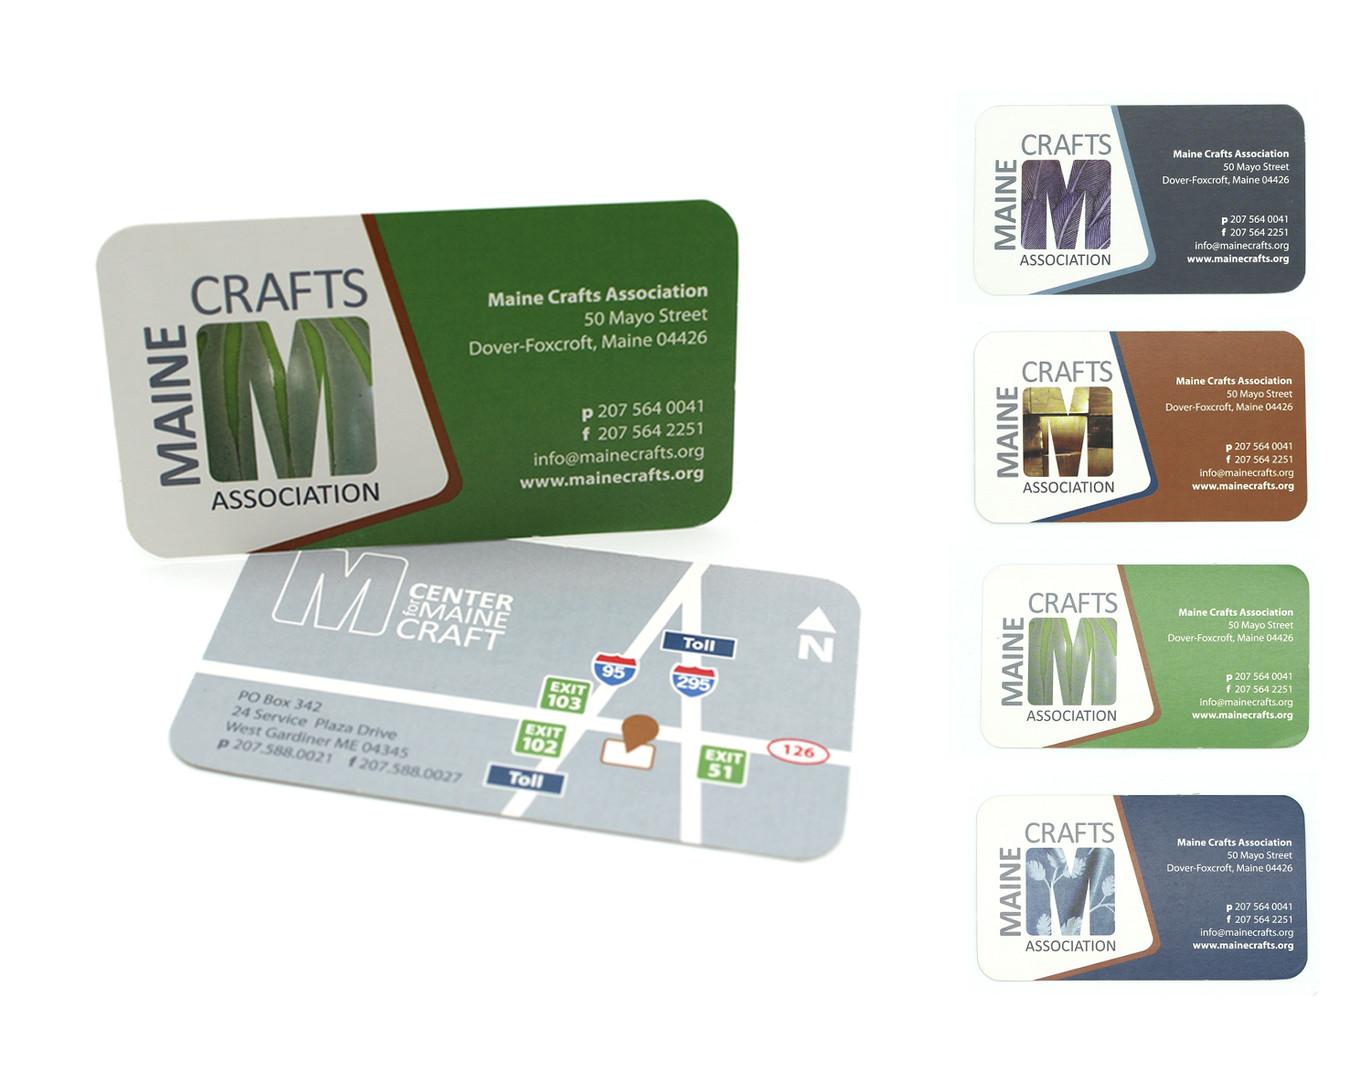 MAINE CRAFT BUSINESS CARDS.jpg